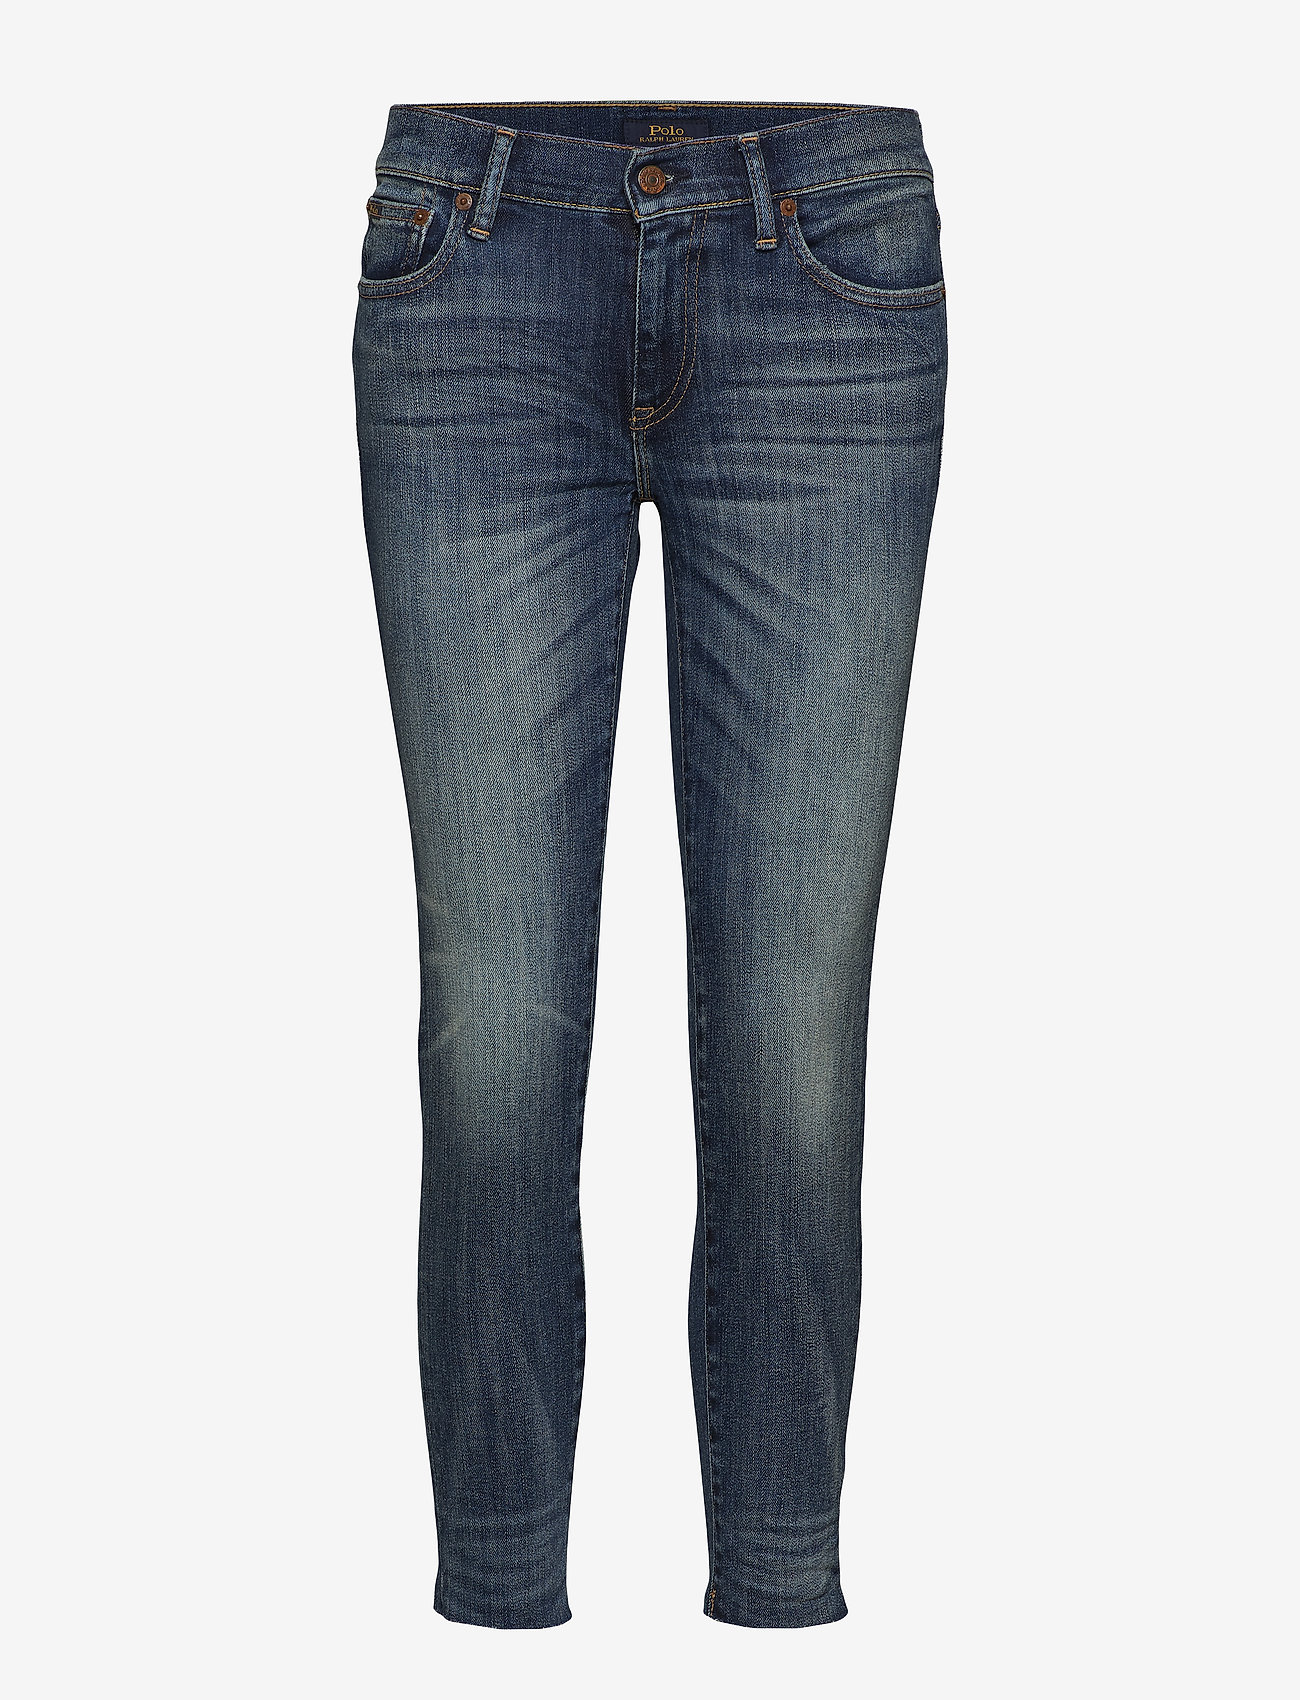 Polo Ralph Lauren - Tompkins Skinny Crop Jean - skinny jeans - dark indigo - 0